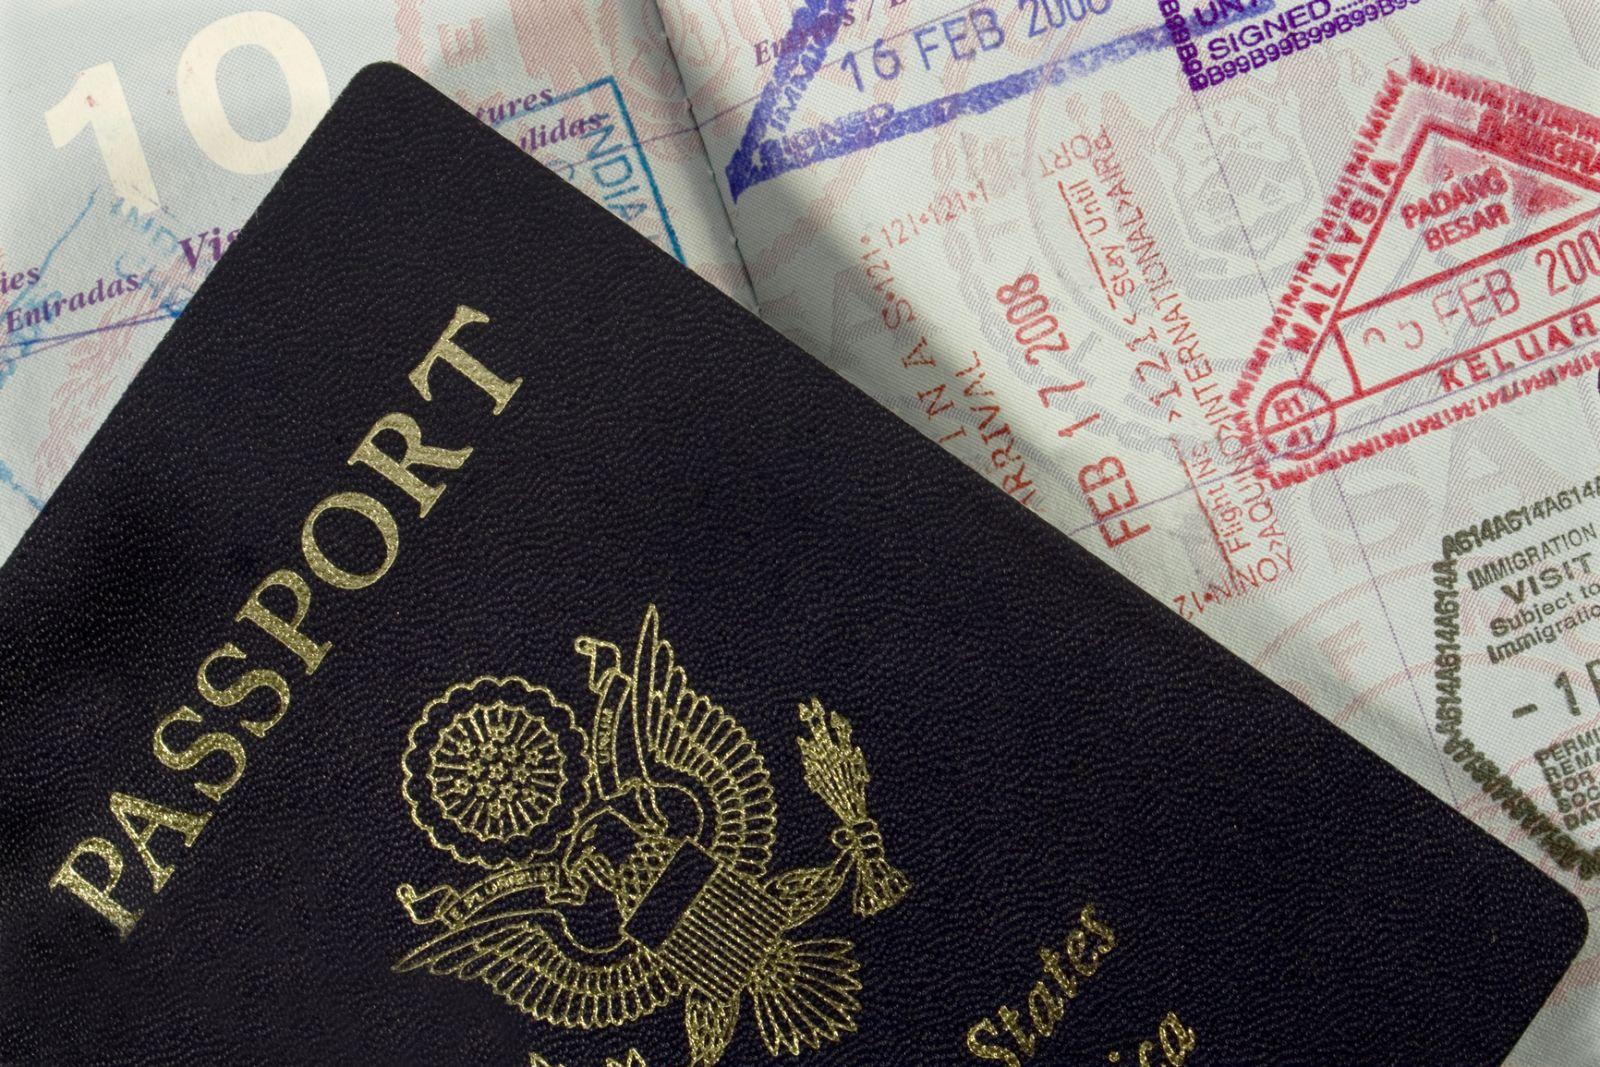 US ESTA Visa for Japan process